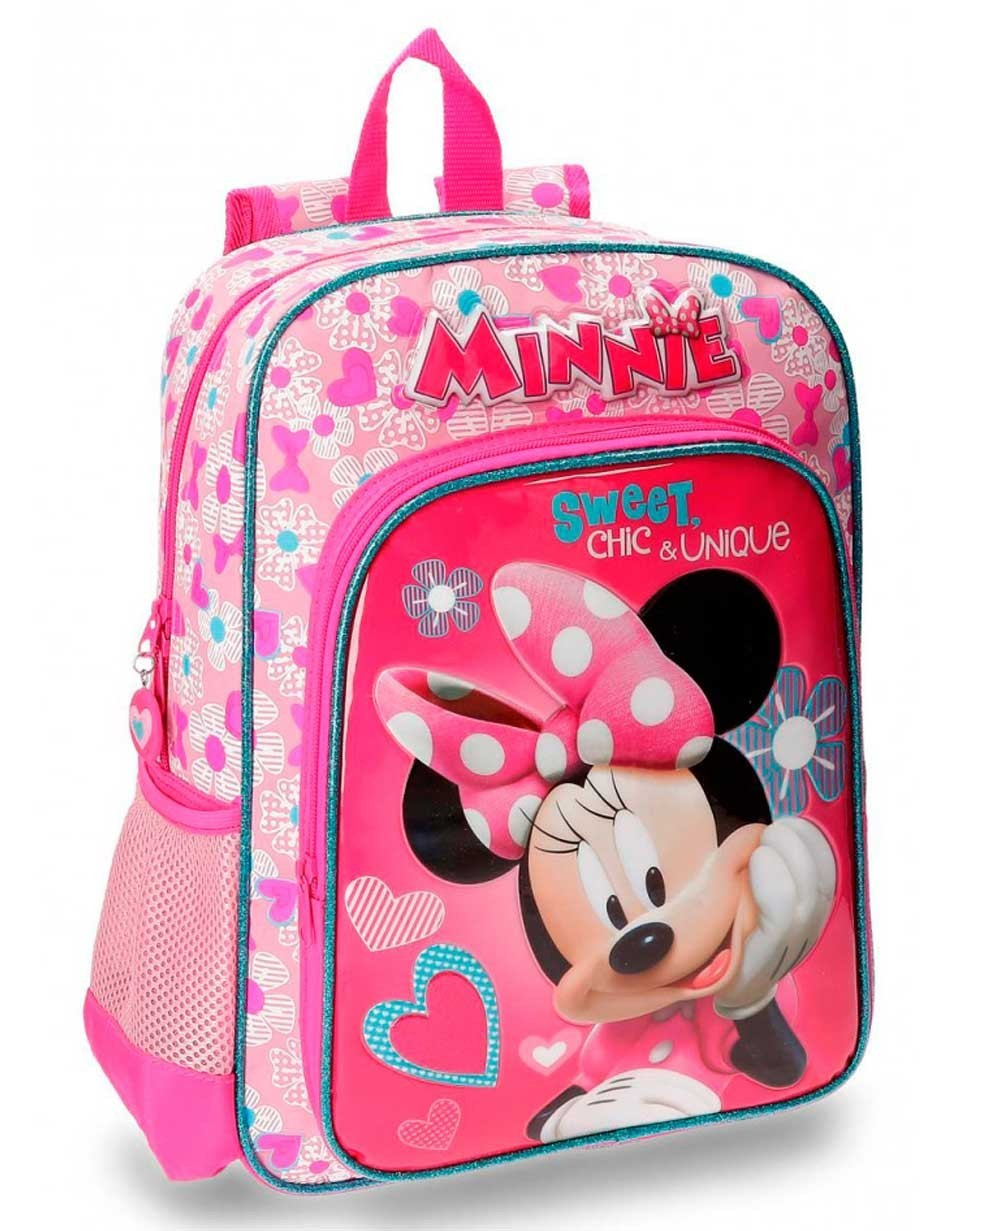 Minnie Fabulous Mochila Preescolar adaptable Rosa (Foto )